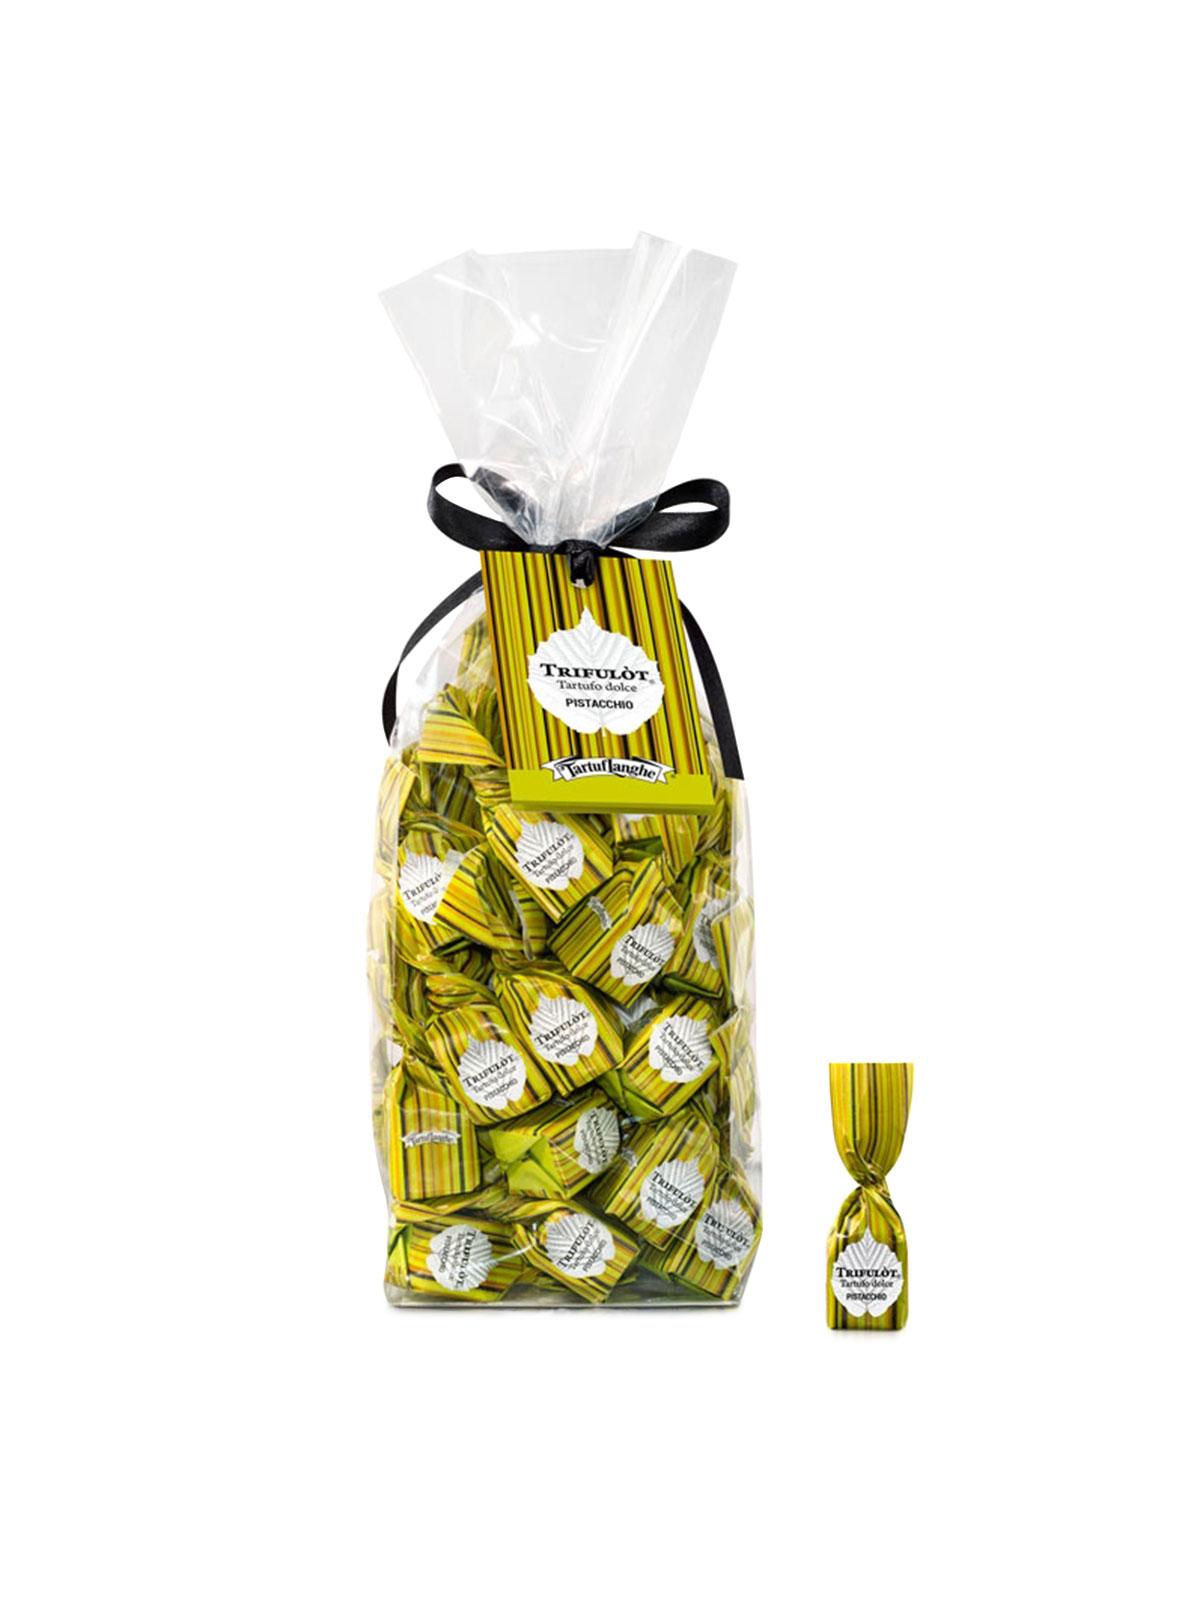 Trifulòt Pistachio Sweet Truffle - Sweets, Treats & Snacks - Buon'Italia